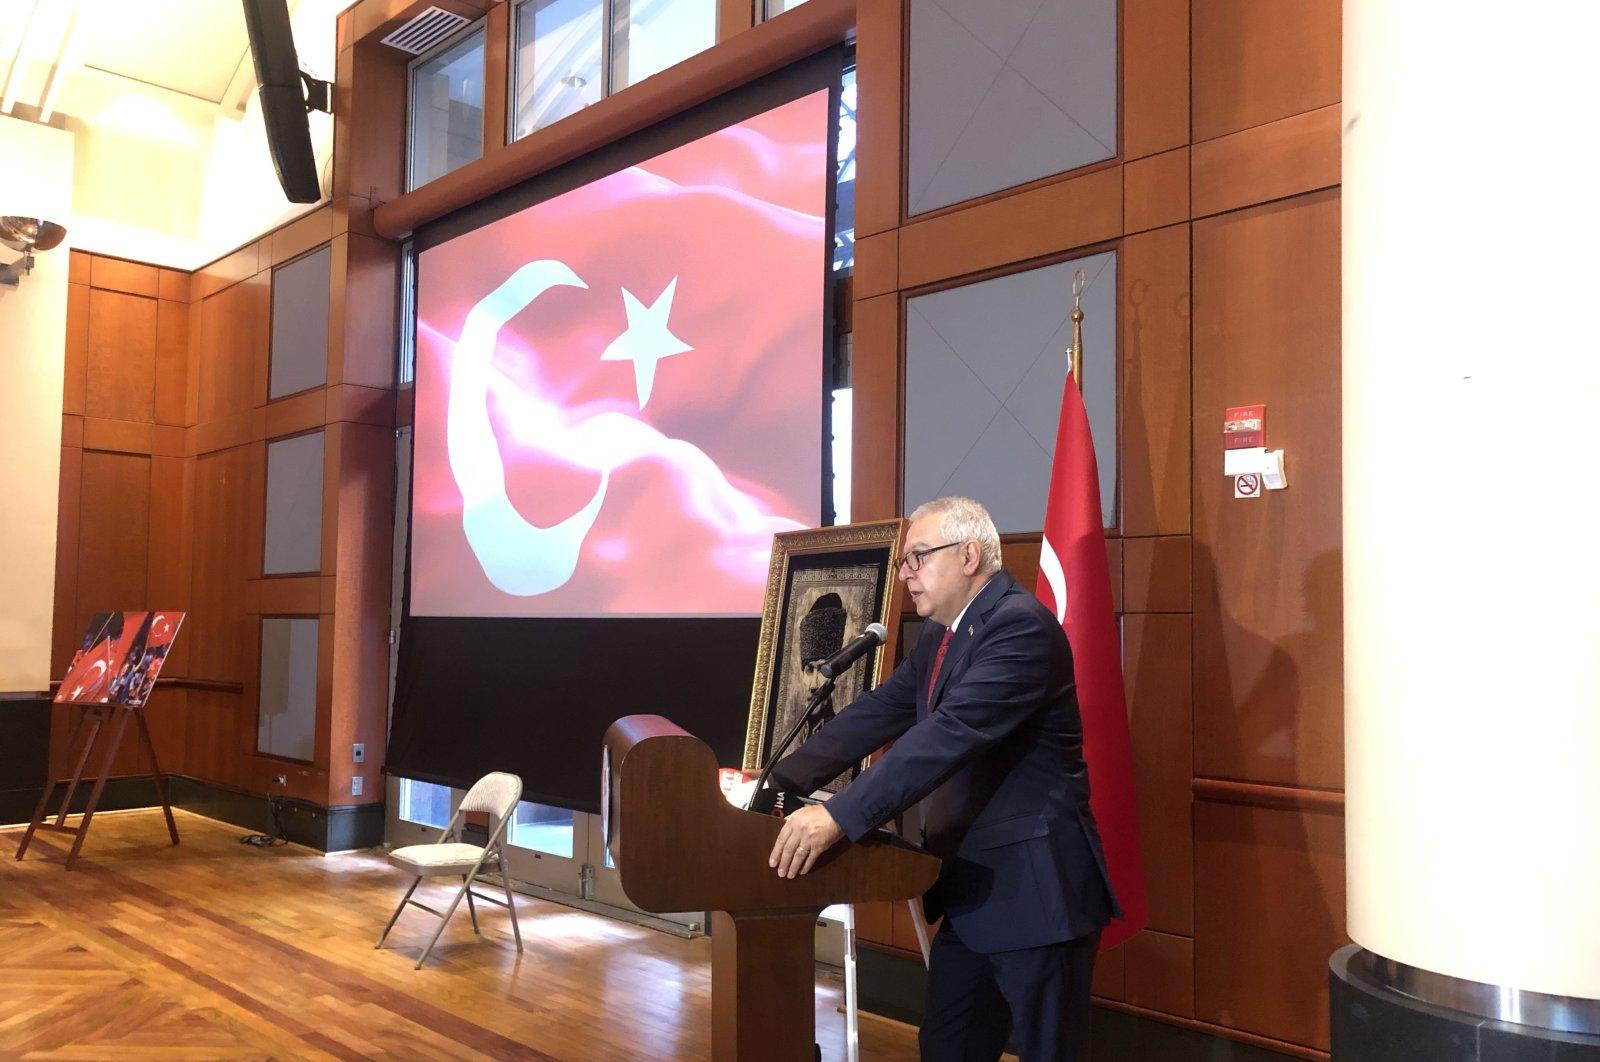 Turkey's Ambassador to the U.S. Serdar Kılıç speaks at an event to mark Democracy and National Unity Day in Washington, D.C., July 15, 2020. (AA Photo)